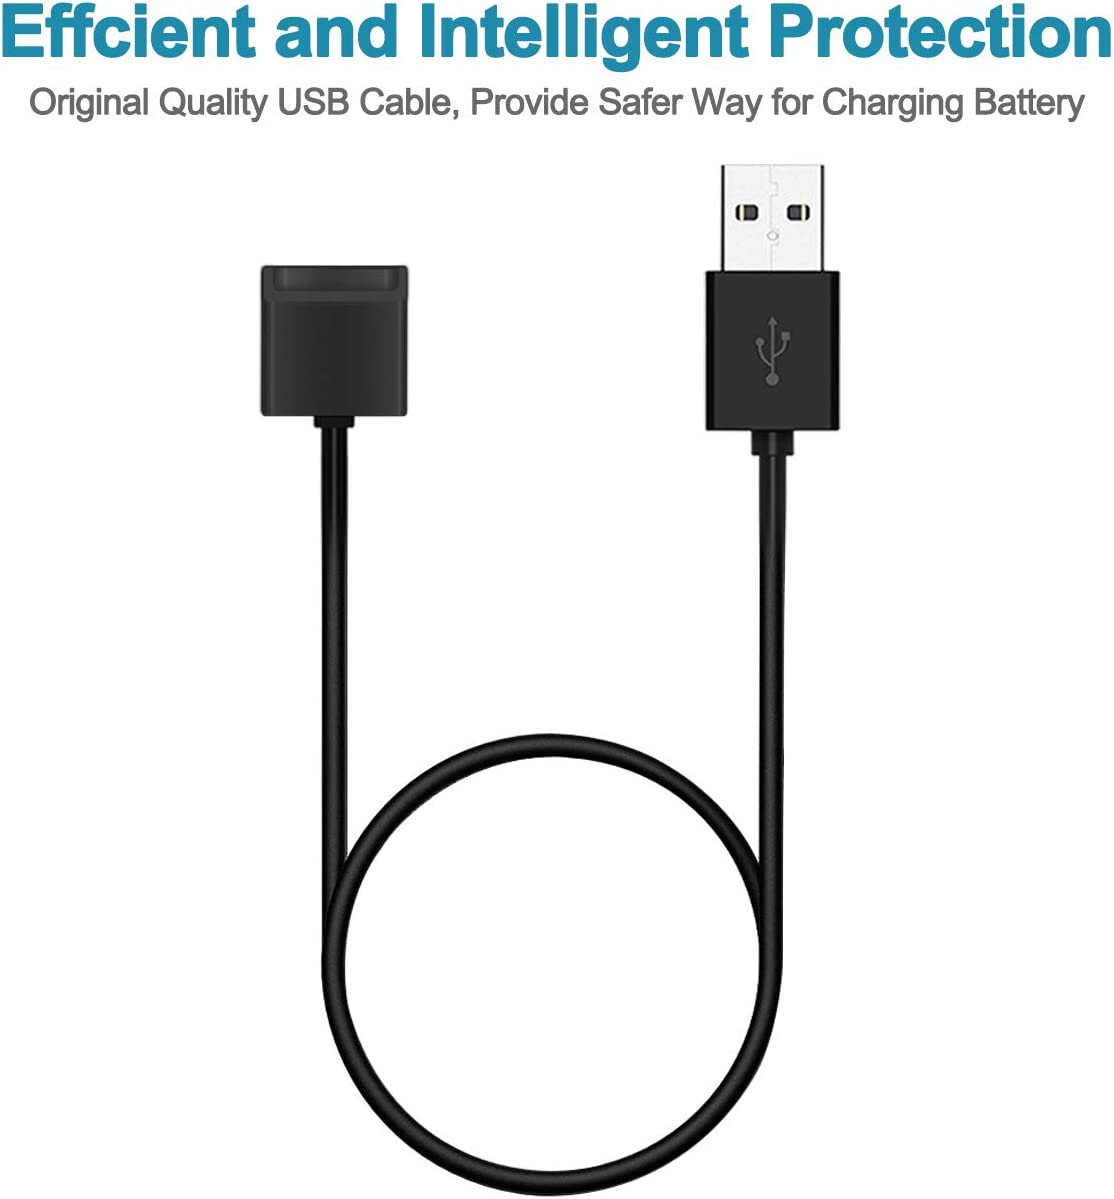 2.6 pies de Largo Cada uno Unokki JUUL Cargador USB magn/ético Cable de Carga r/ápida B07P7P4RQZ